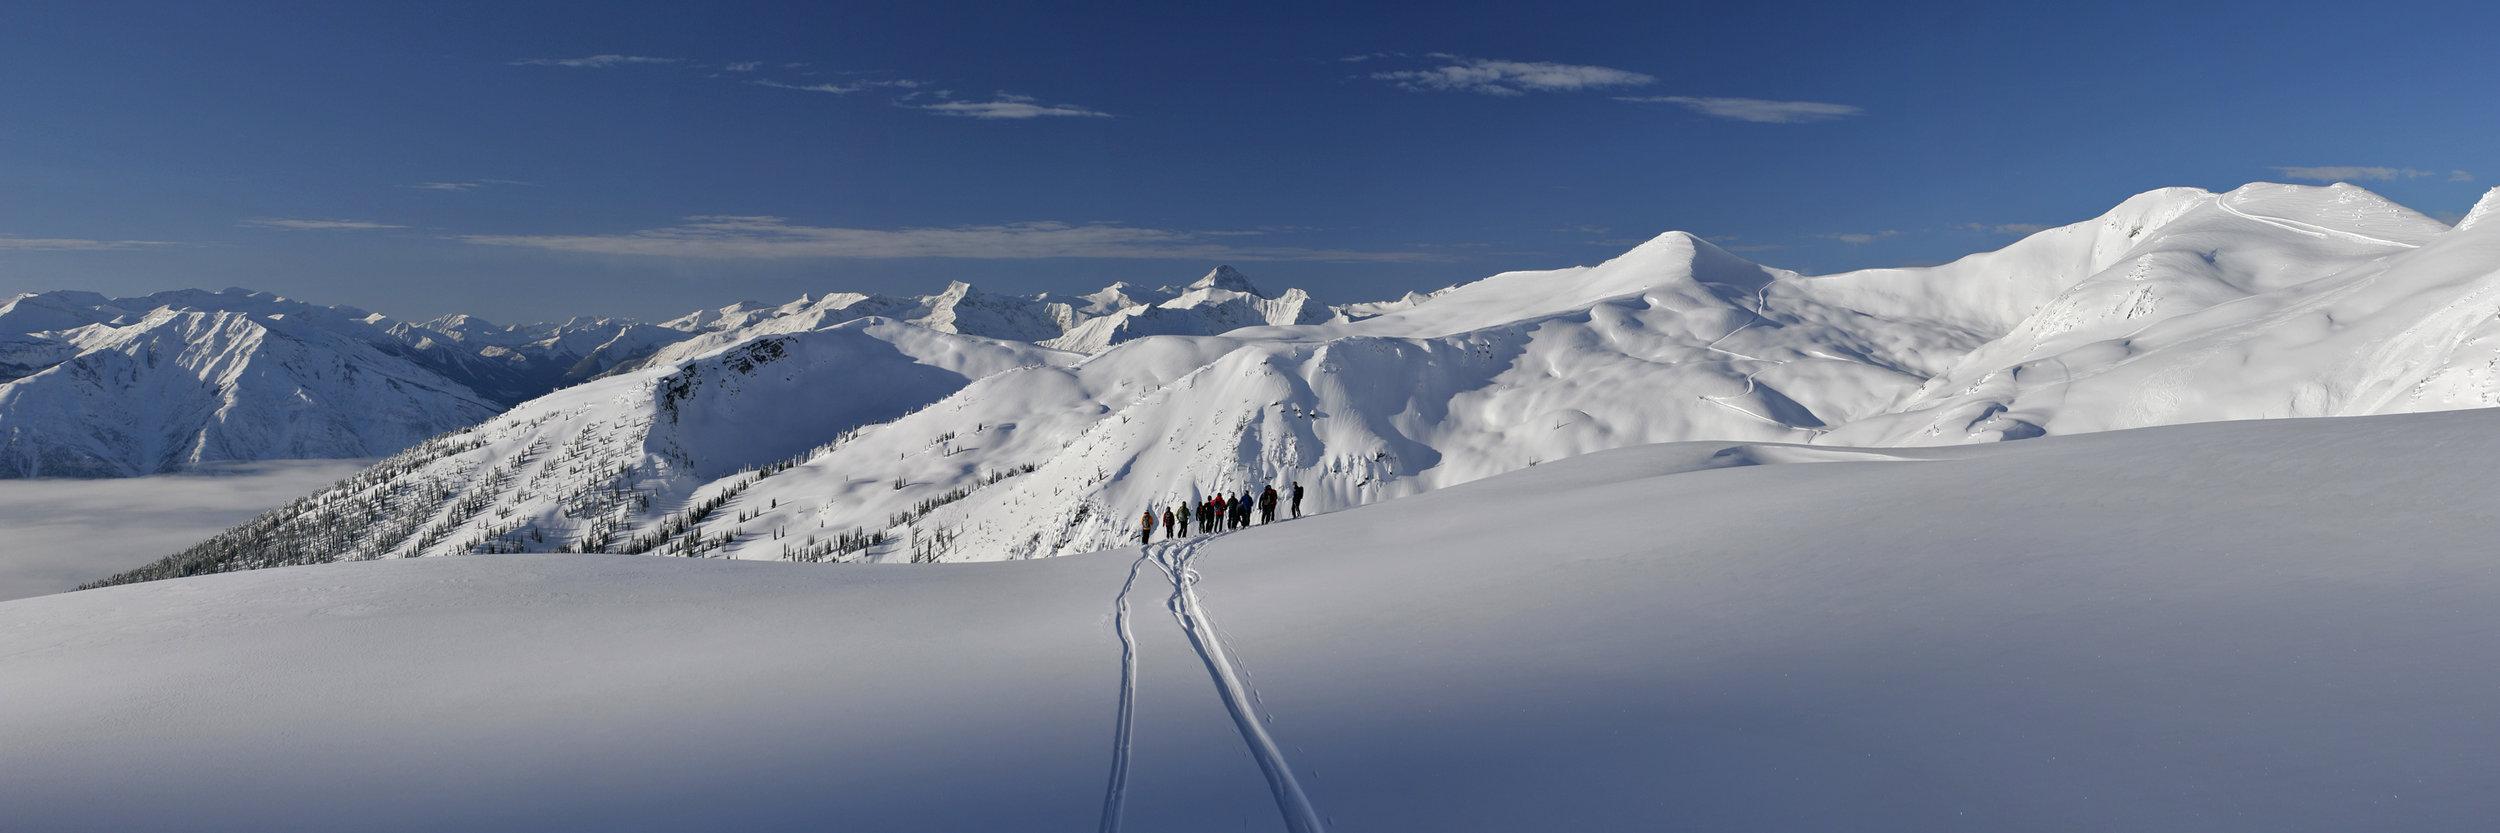 High Country Ski Guides Ski Touring